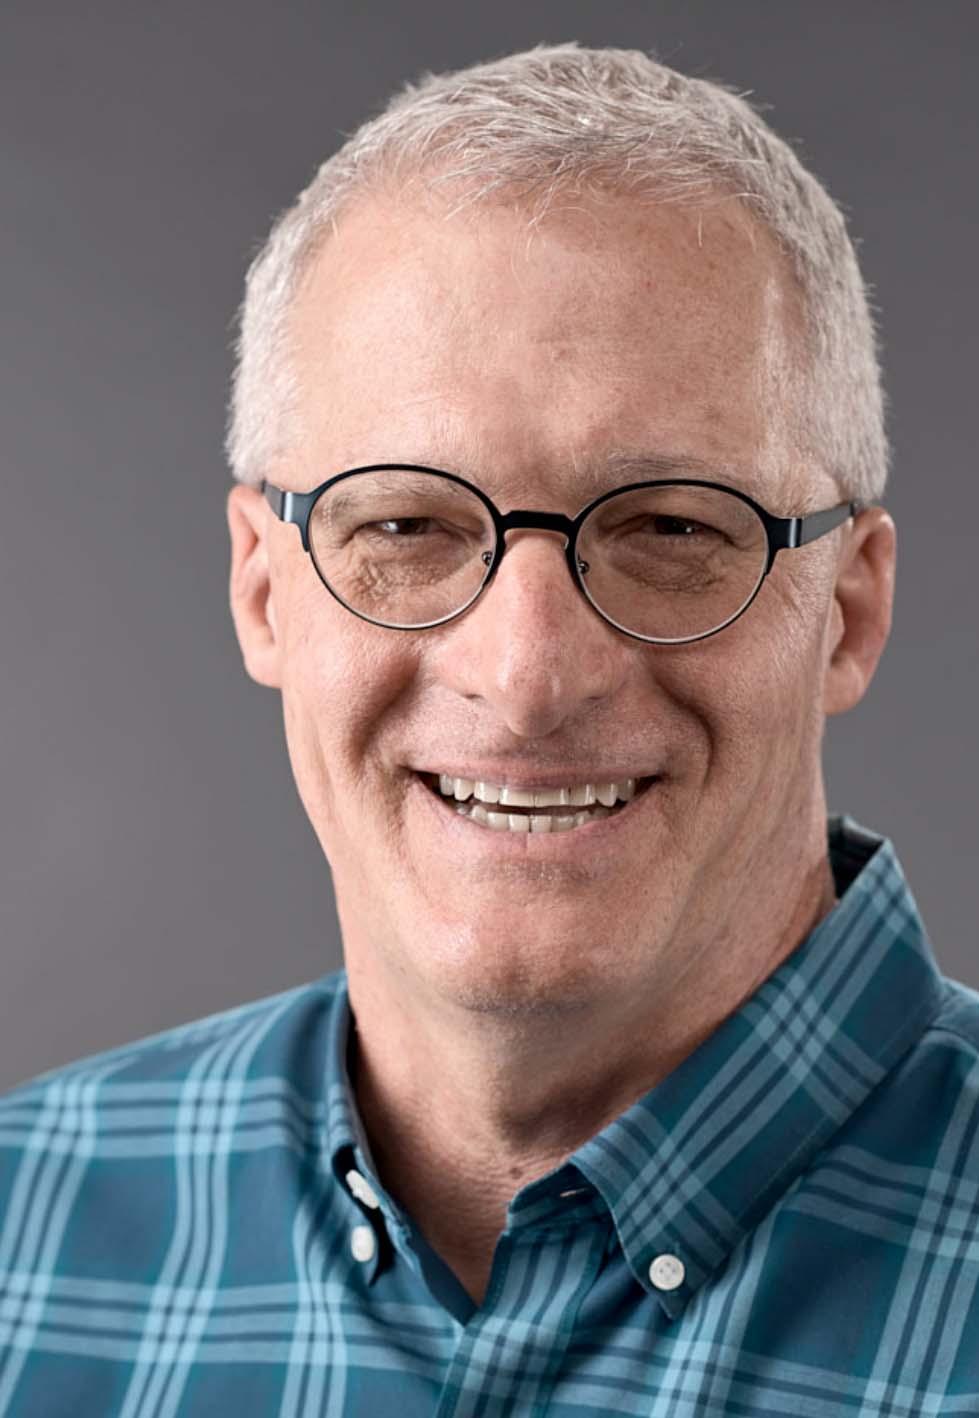 Sam Doying, Headshot showing masculine lighitng with glasses